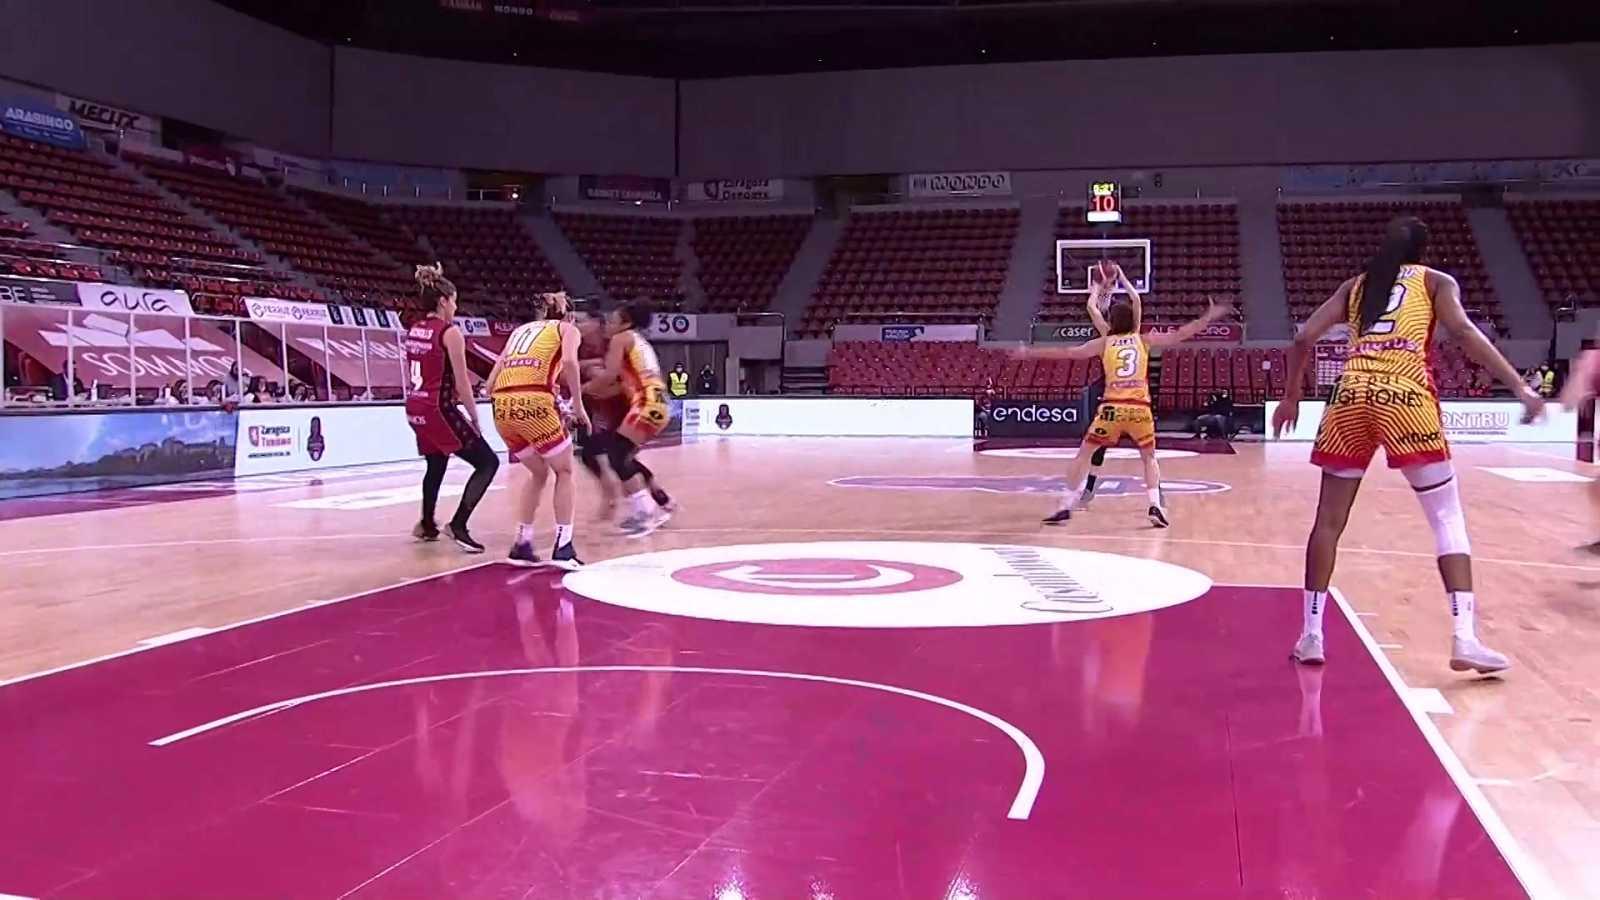 Baloncesto - Liga femenina Endesa. 20ª jornada: Casademont Zaragoza - Spar Girona - ver ahora